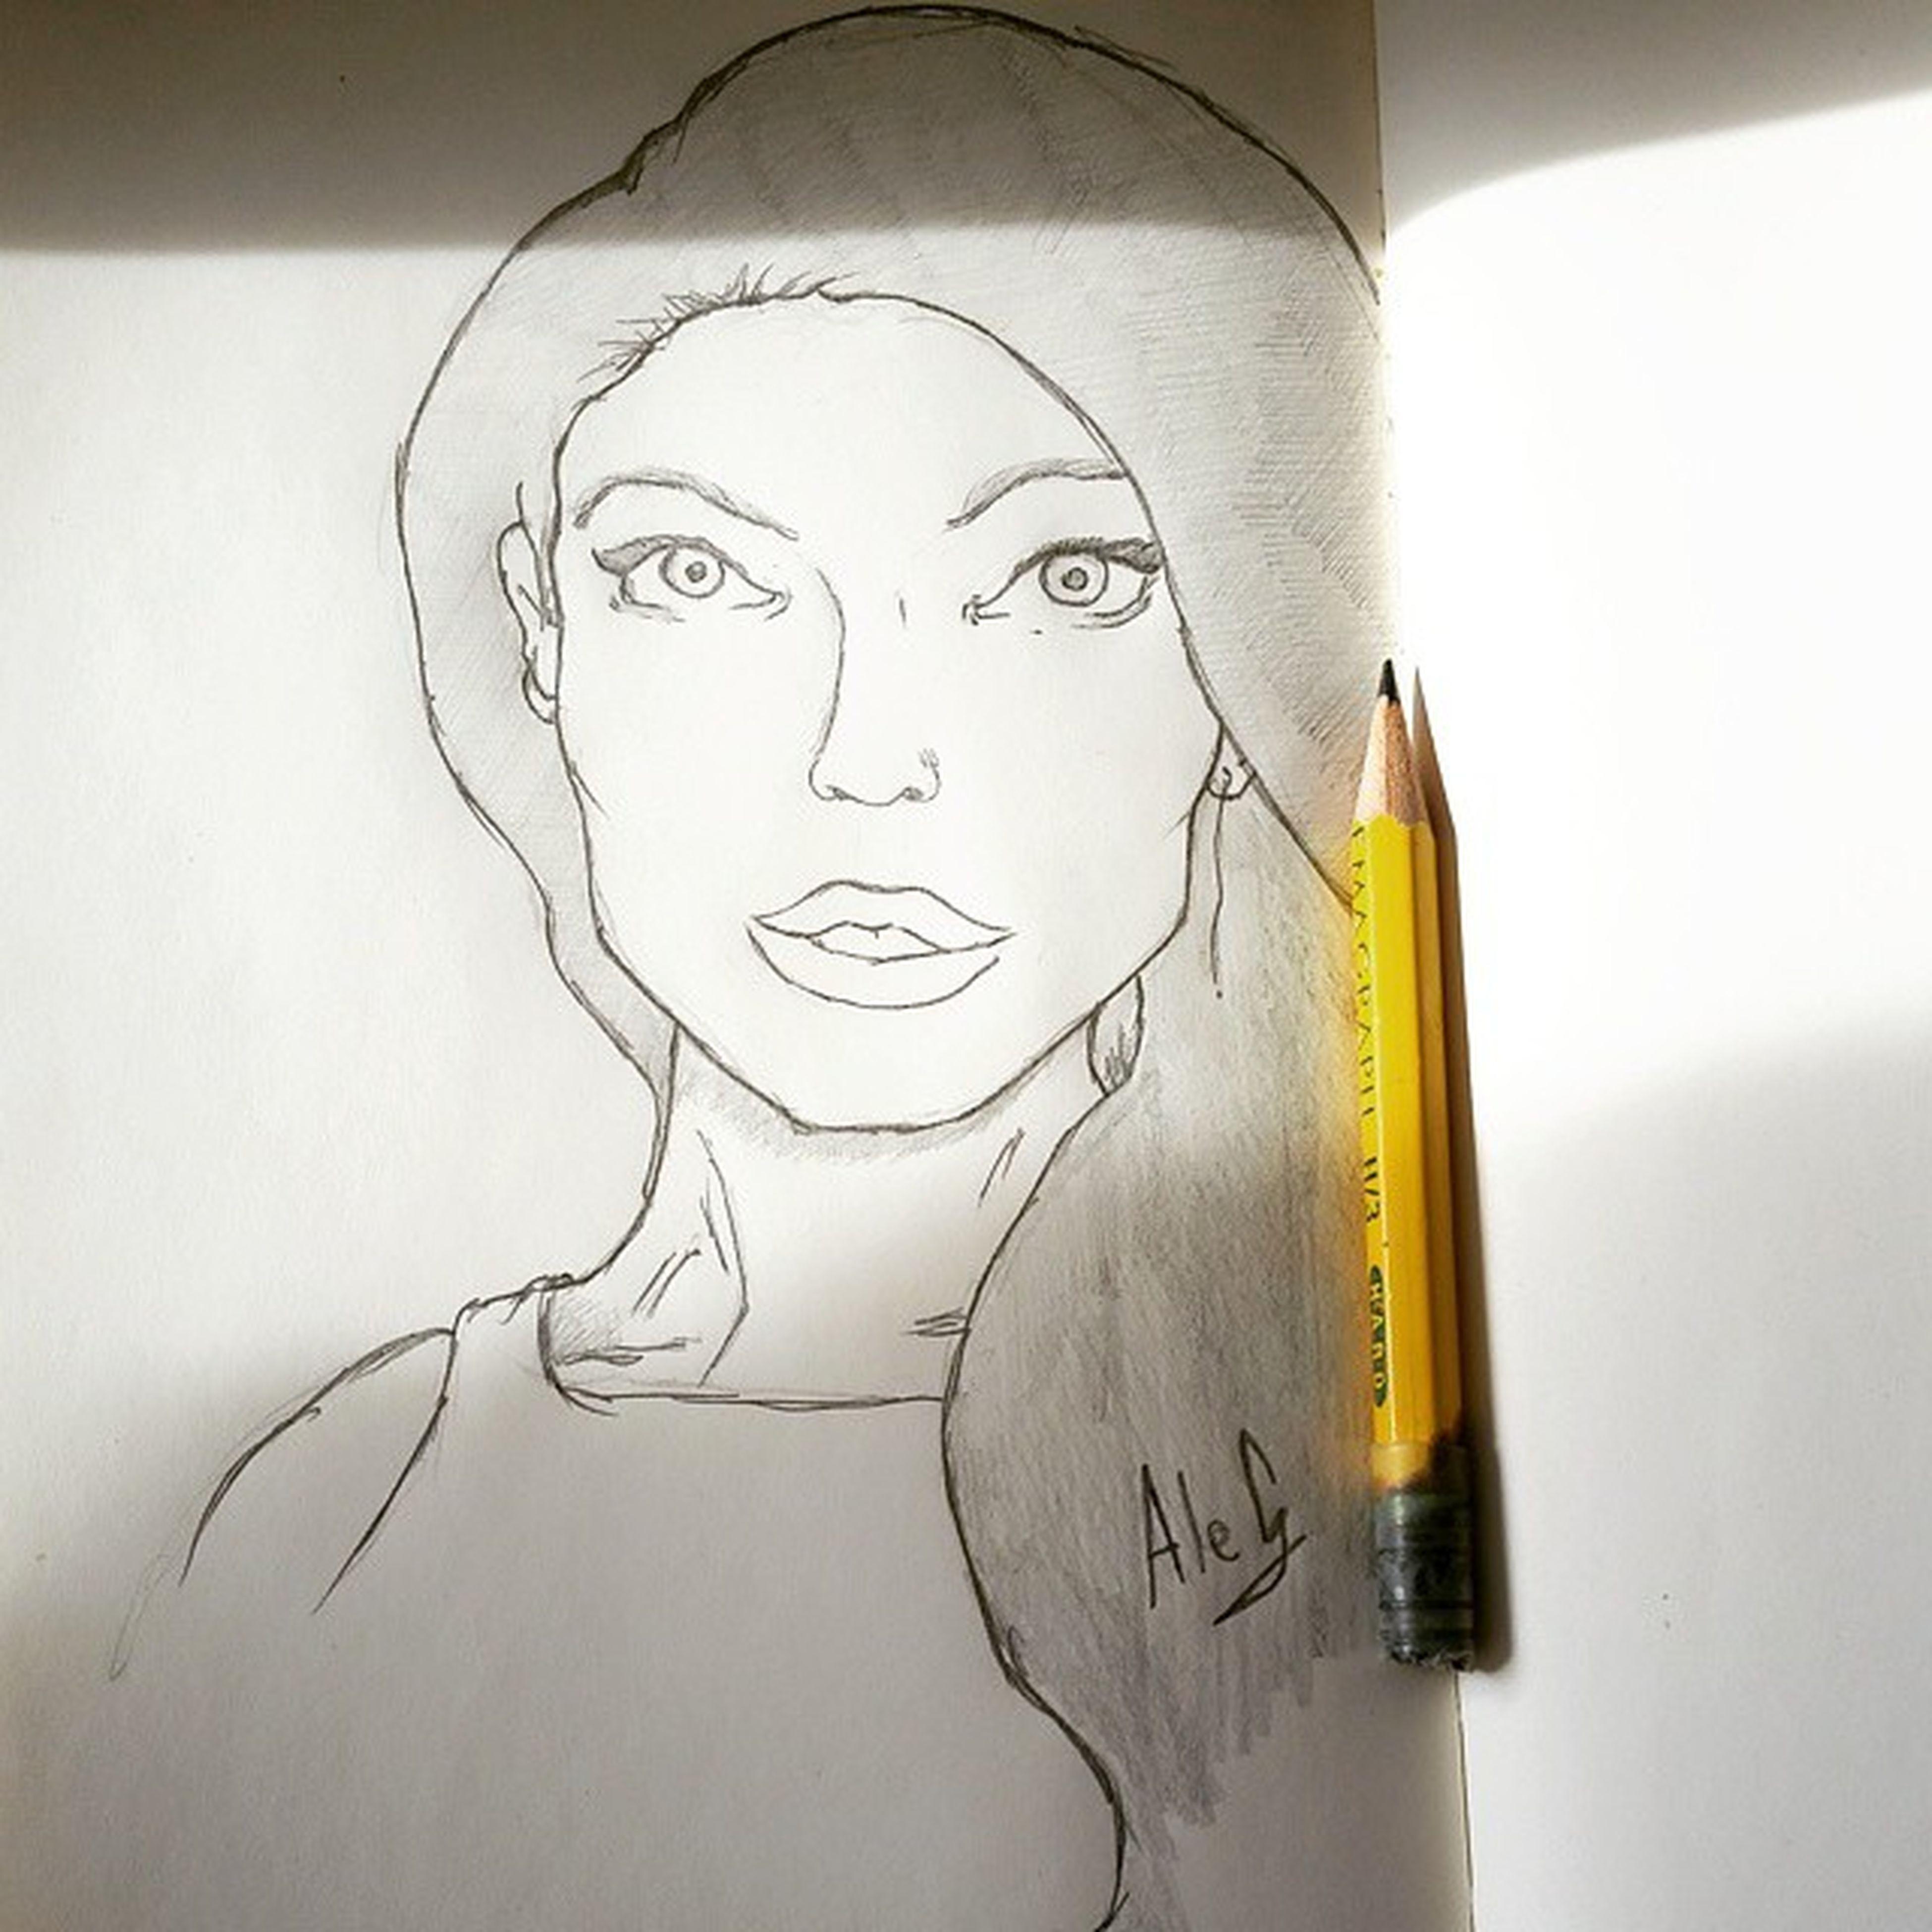 Drawing Cute Lanoiainclassefabruttecose Disegnotime Fotodinascosto Artistafallito Emily❤